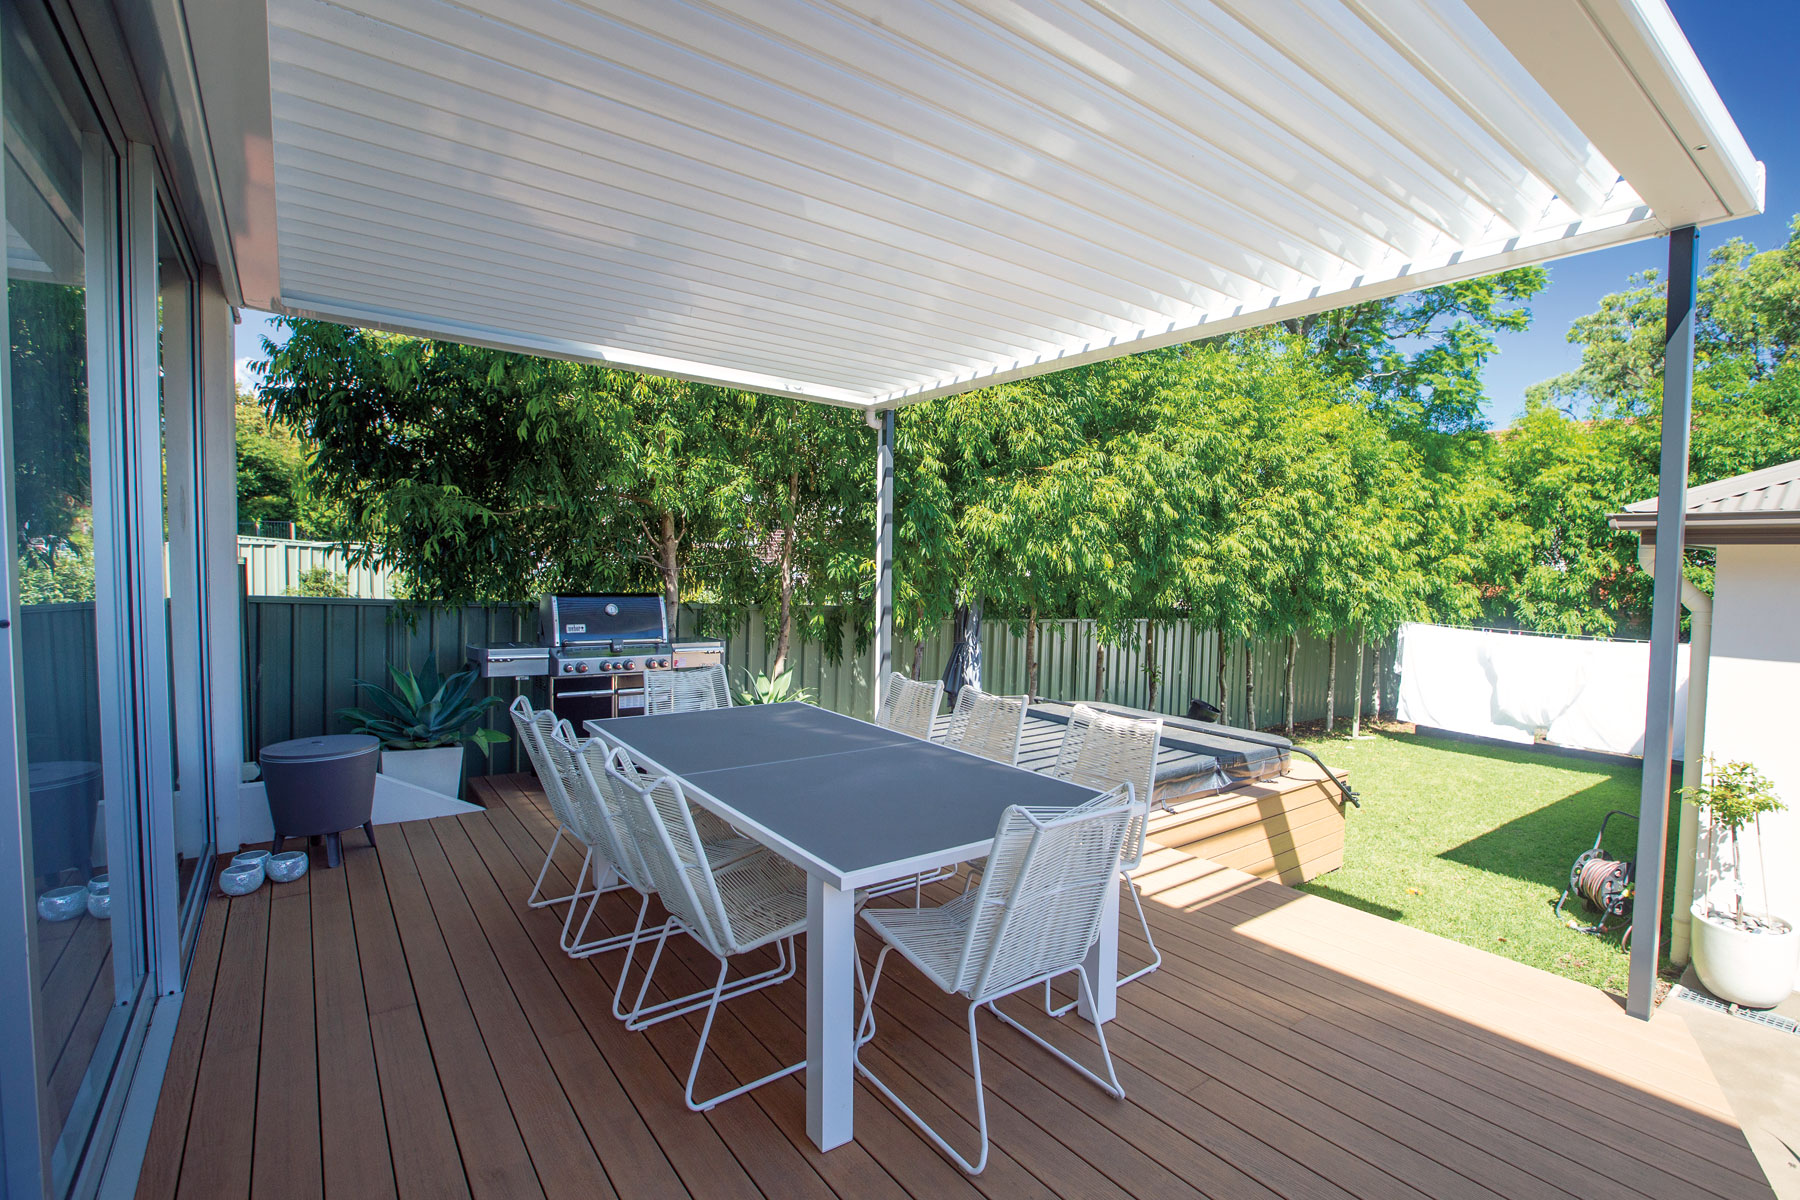 Pergolas Geelong | Melbourne Pergola | Carport | Hoppers